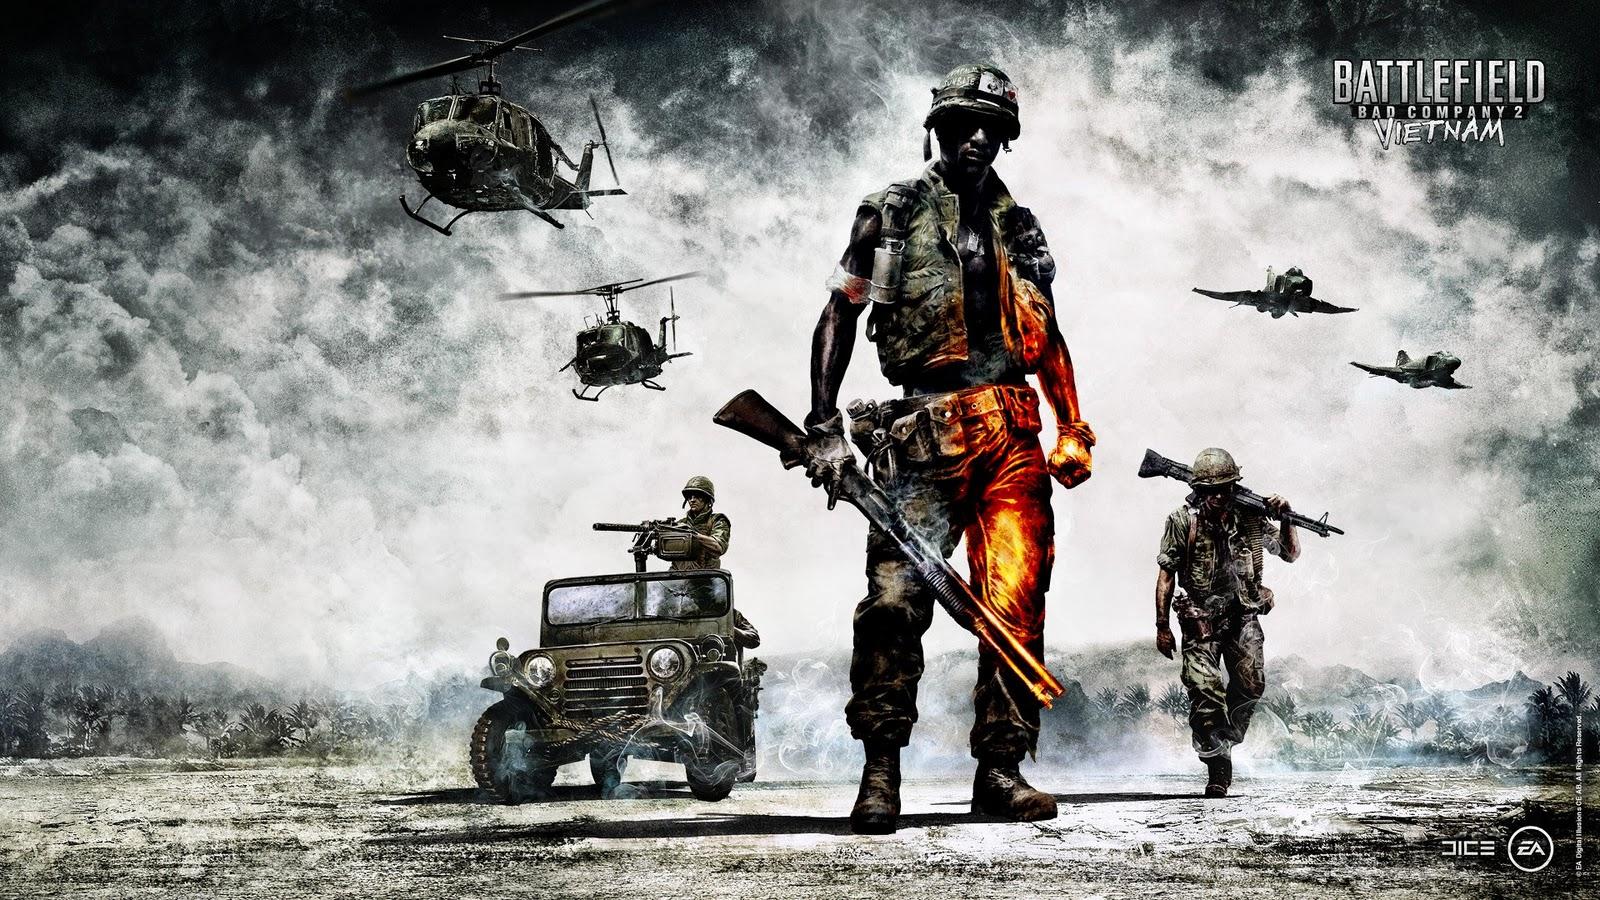 Battlefield Bad Company 2 Wallpaper 1   Battlefield Informer Gallery 1600x900